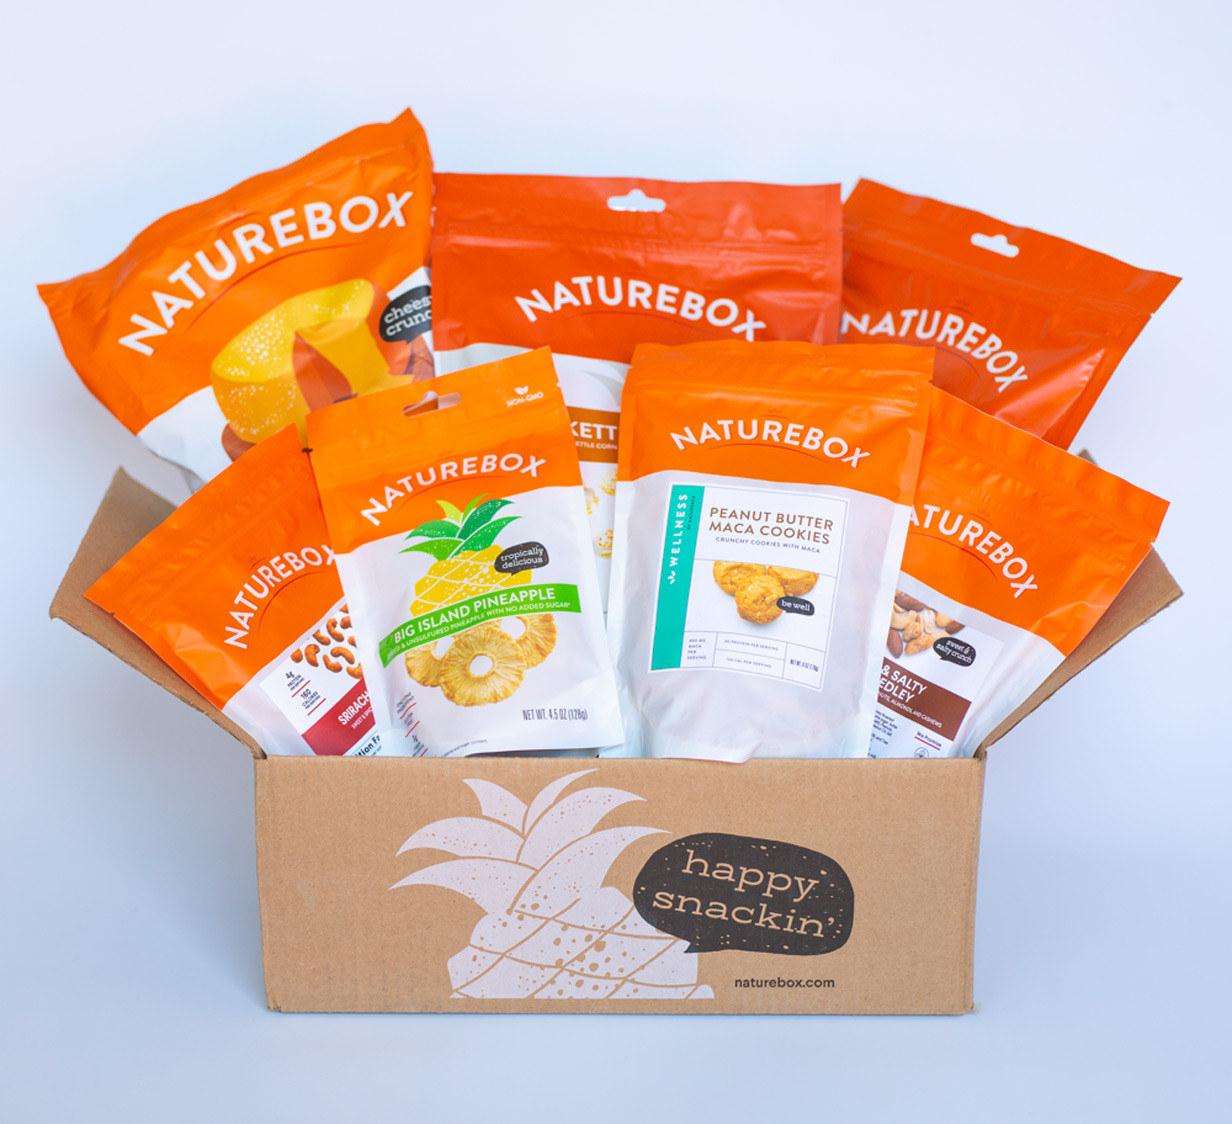 box full of packaged Naturebox snacks